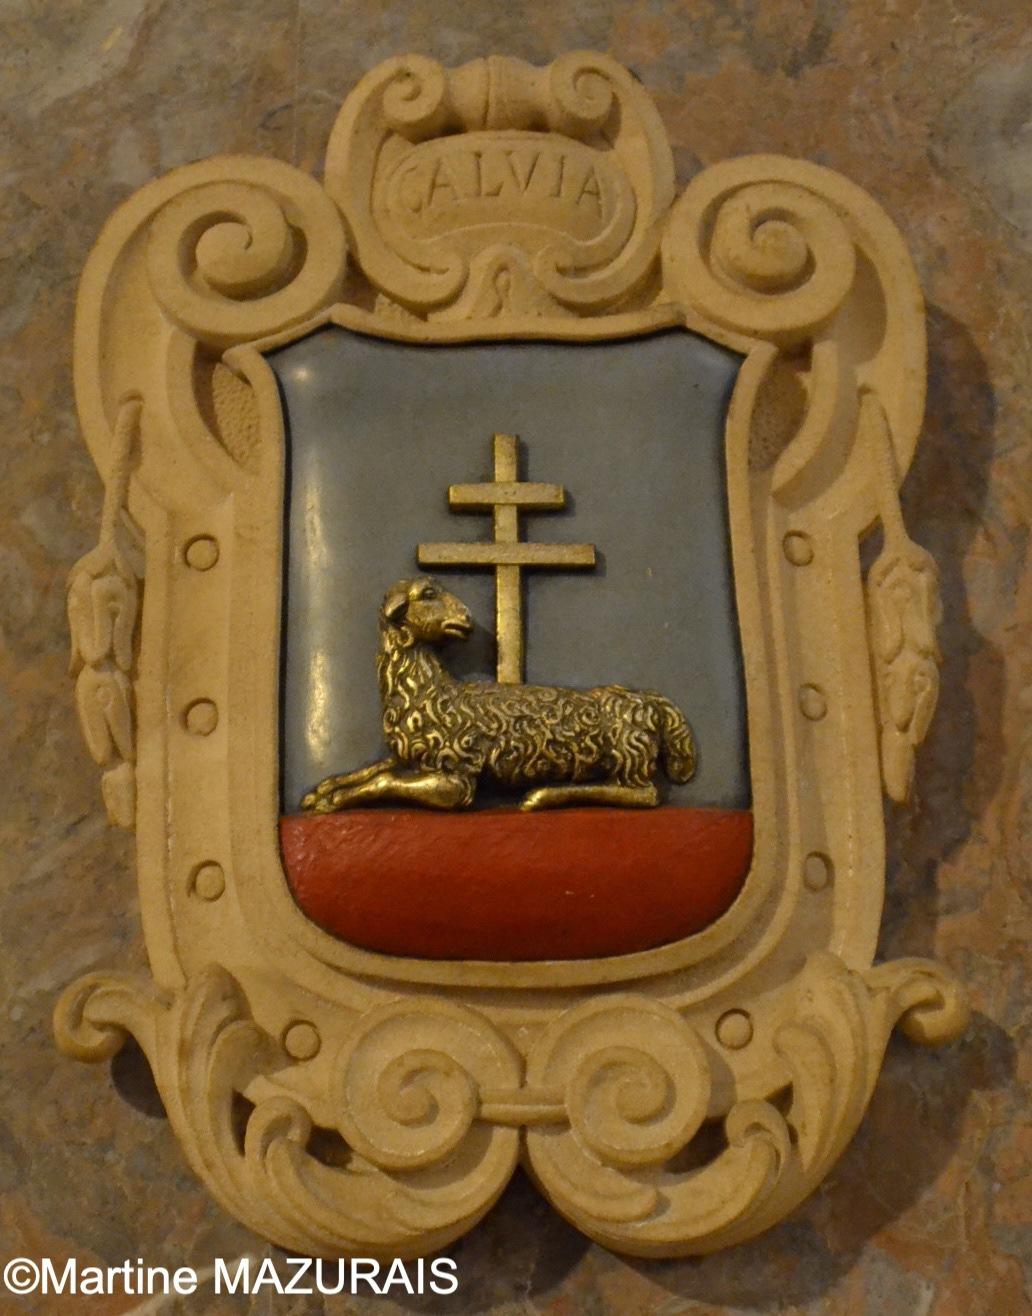 Octobre 2015 - 143 - Monastère de Lluch - Calvia * - copie